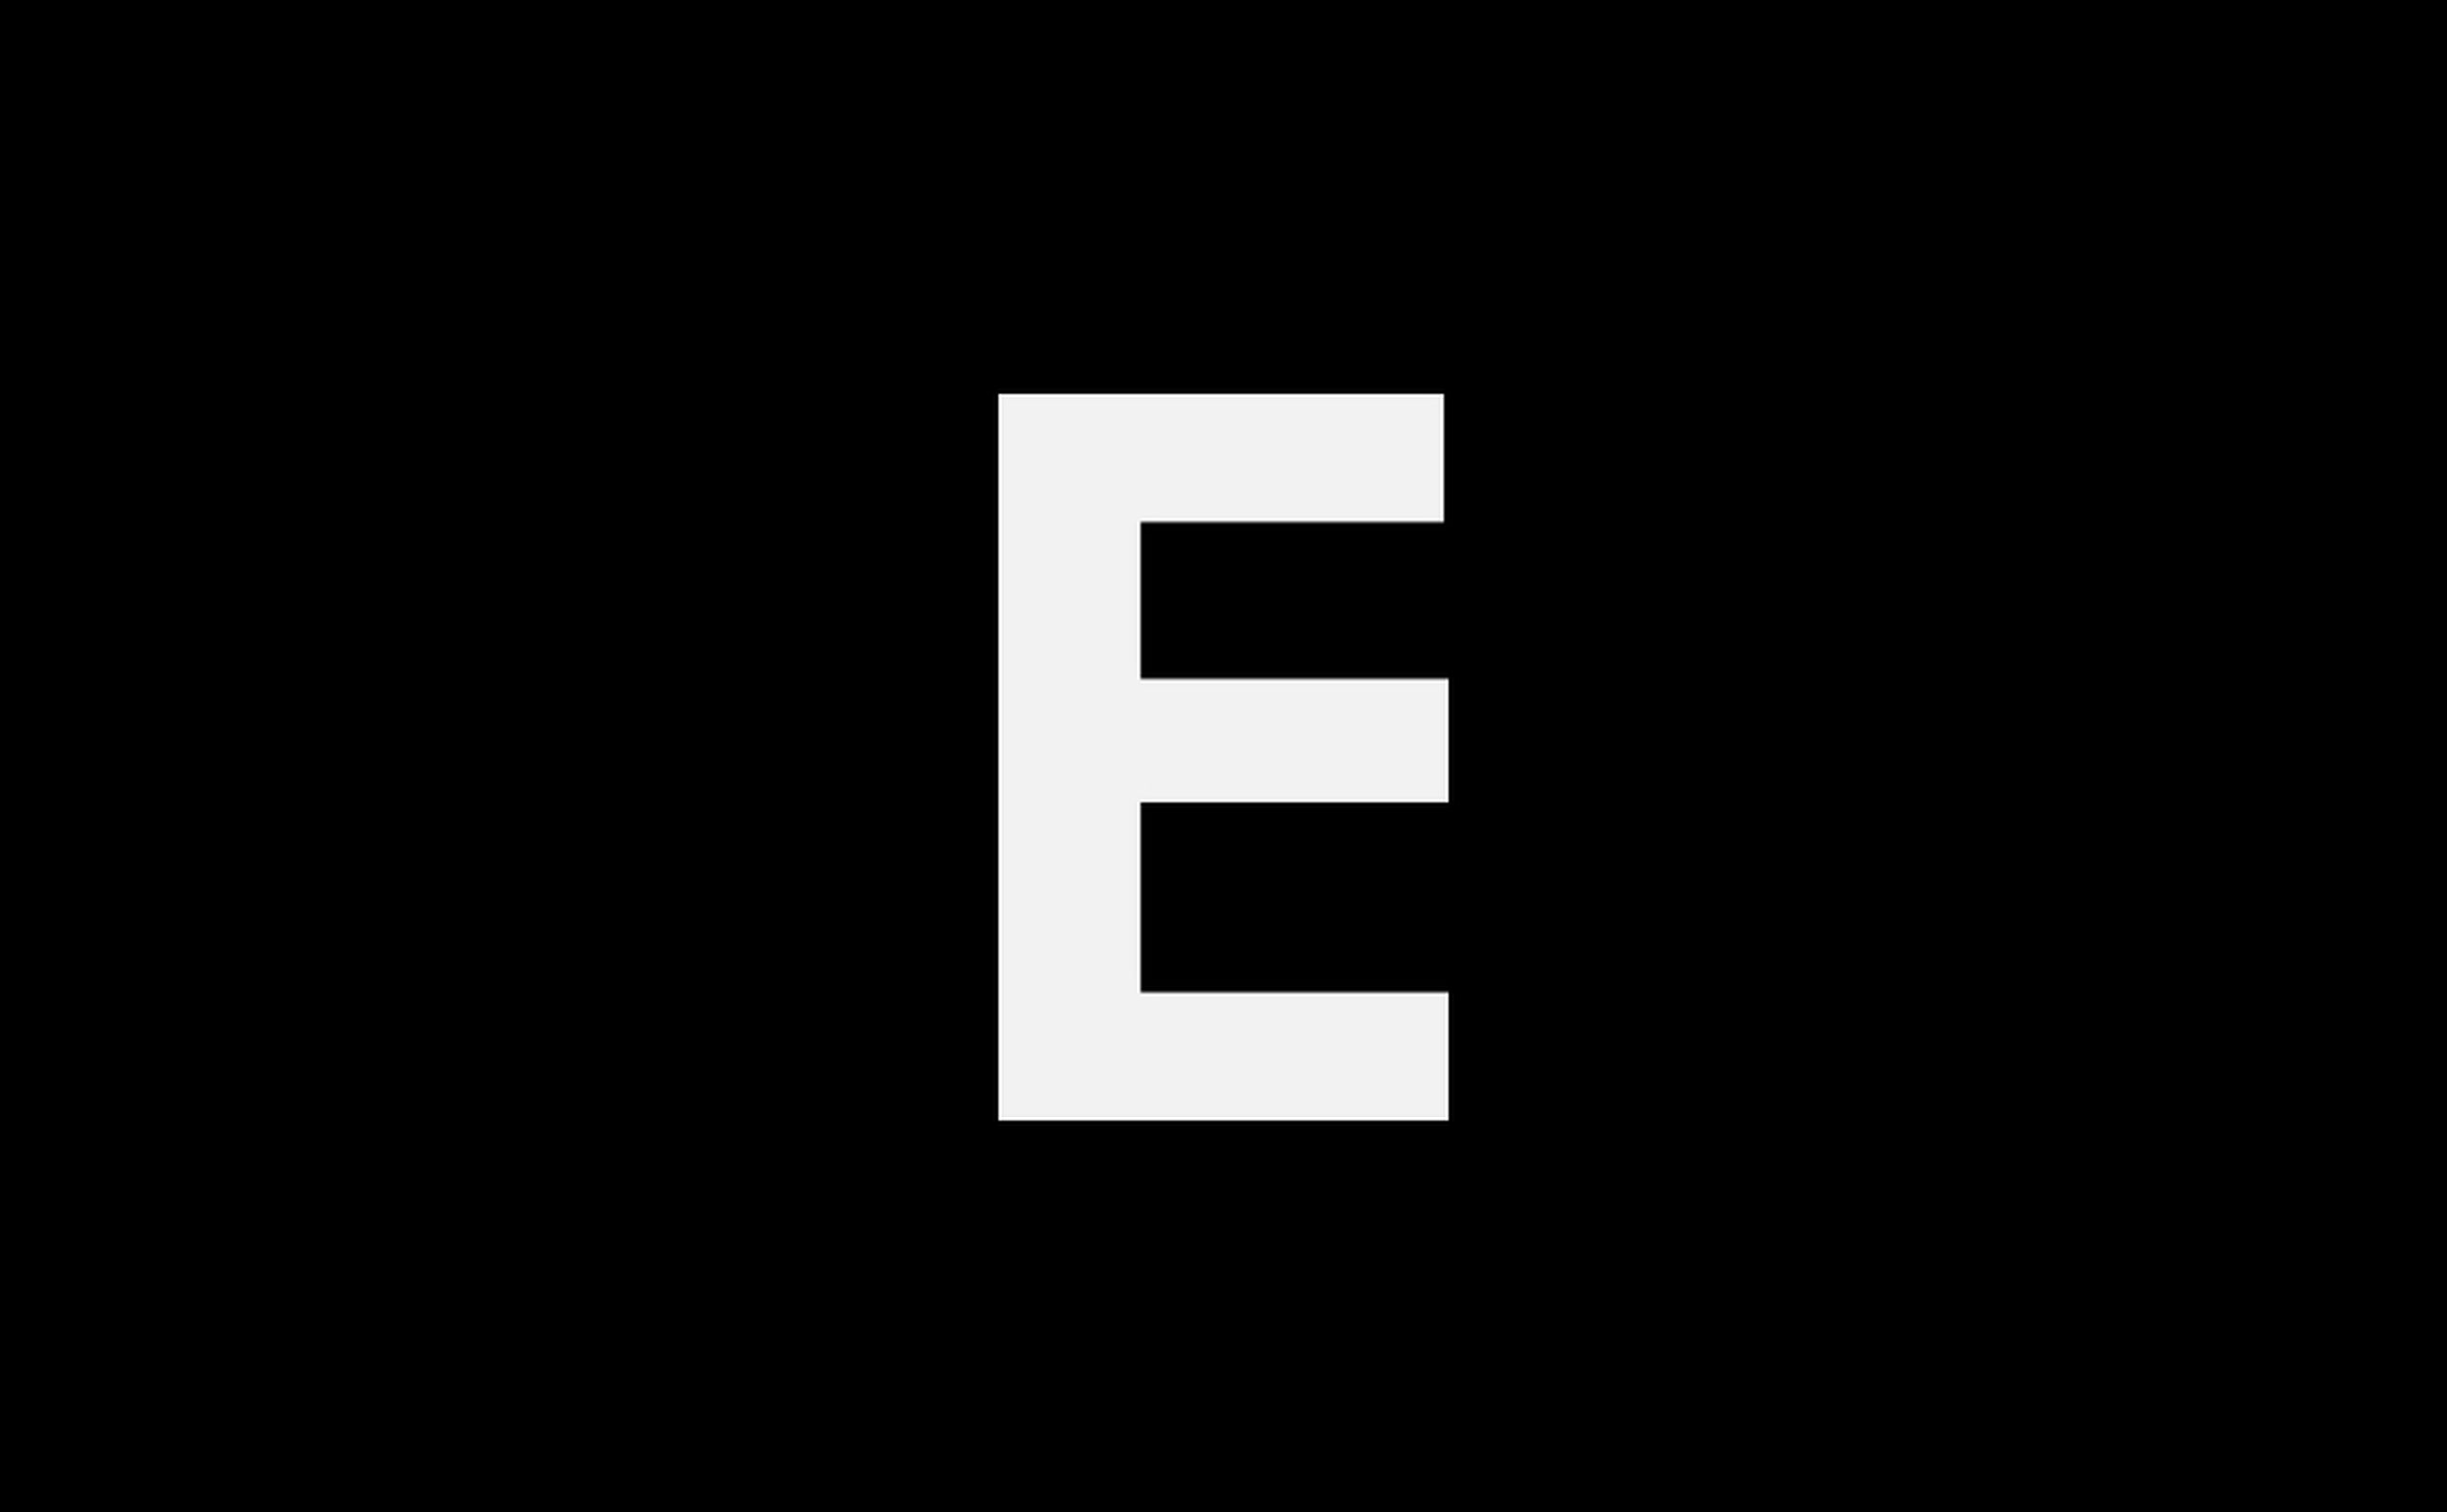 Illuminated modern buildings at night